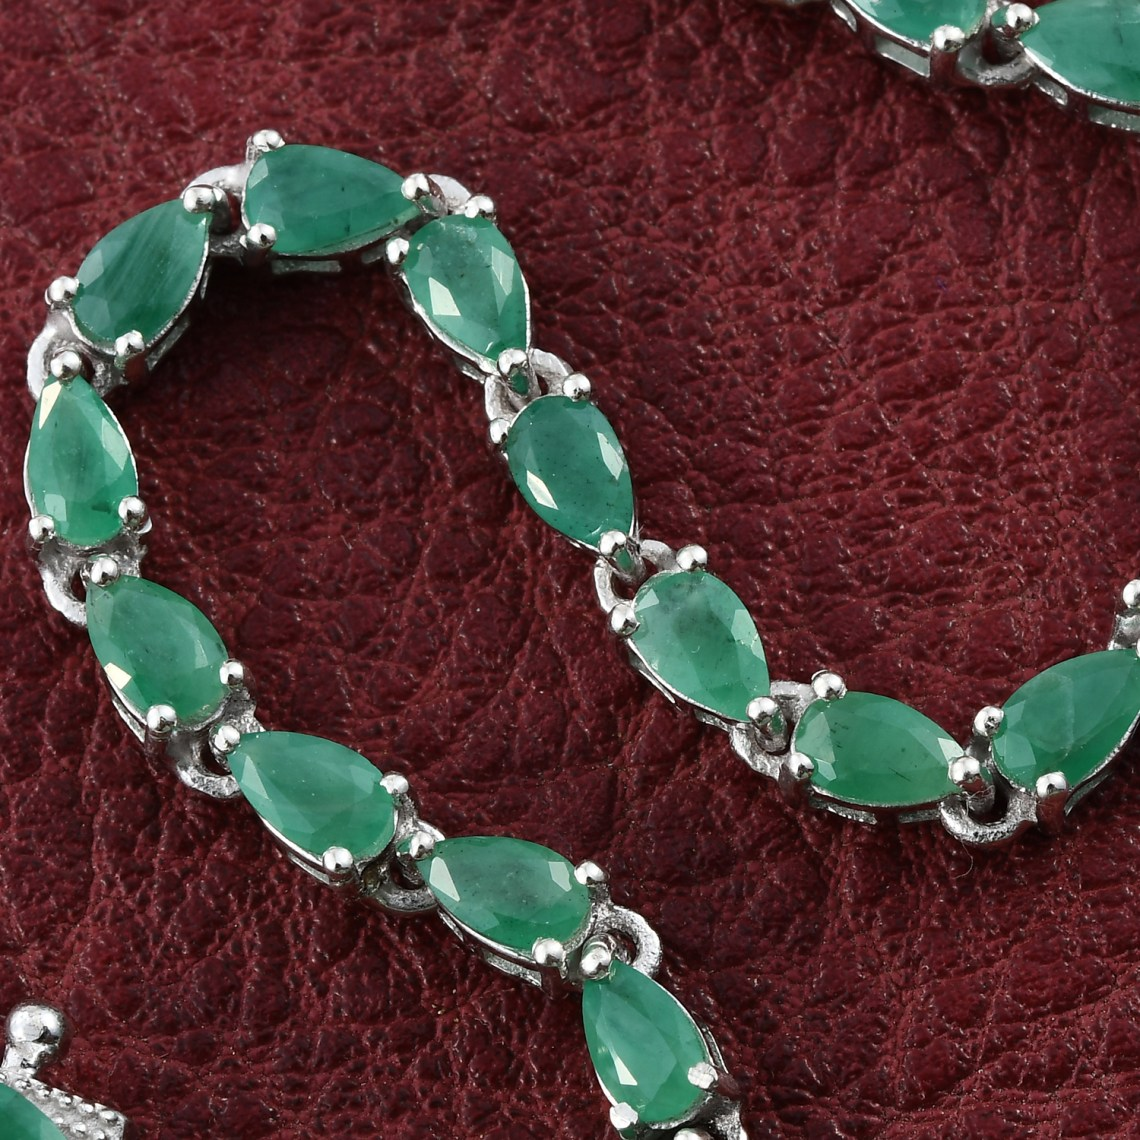 Sokoto emerald line bracelet on red background.